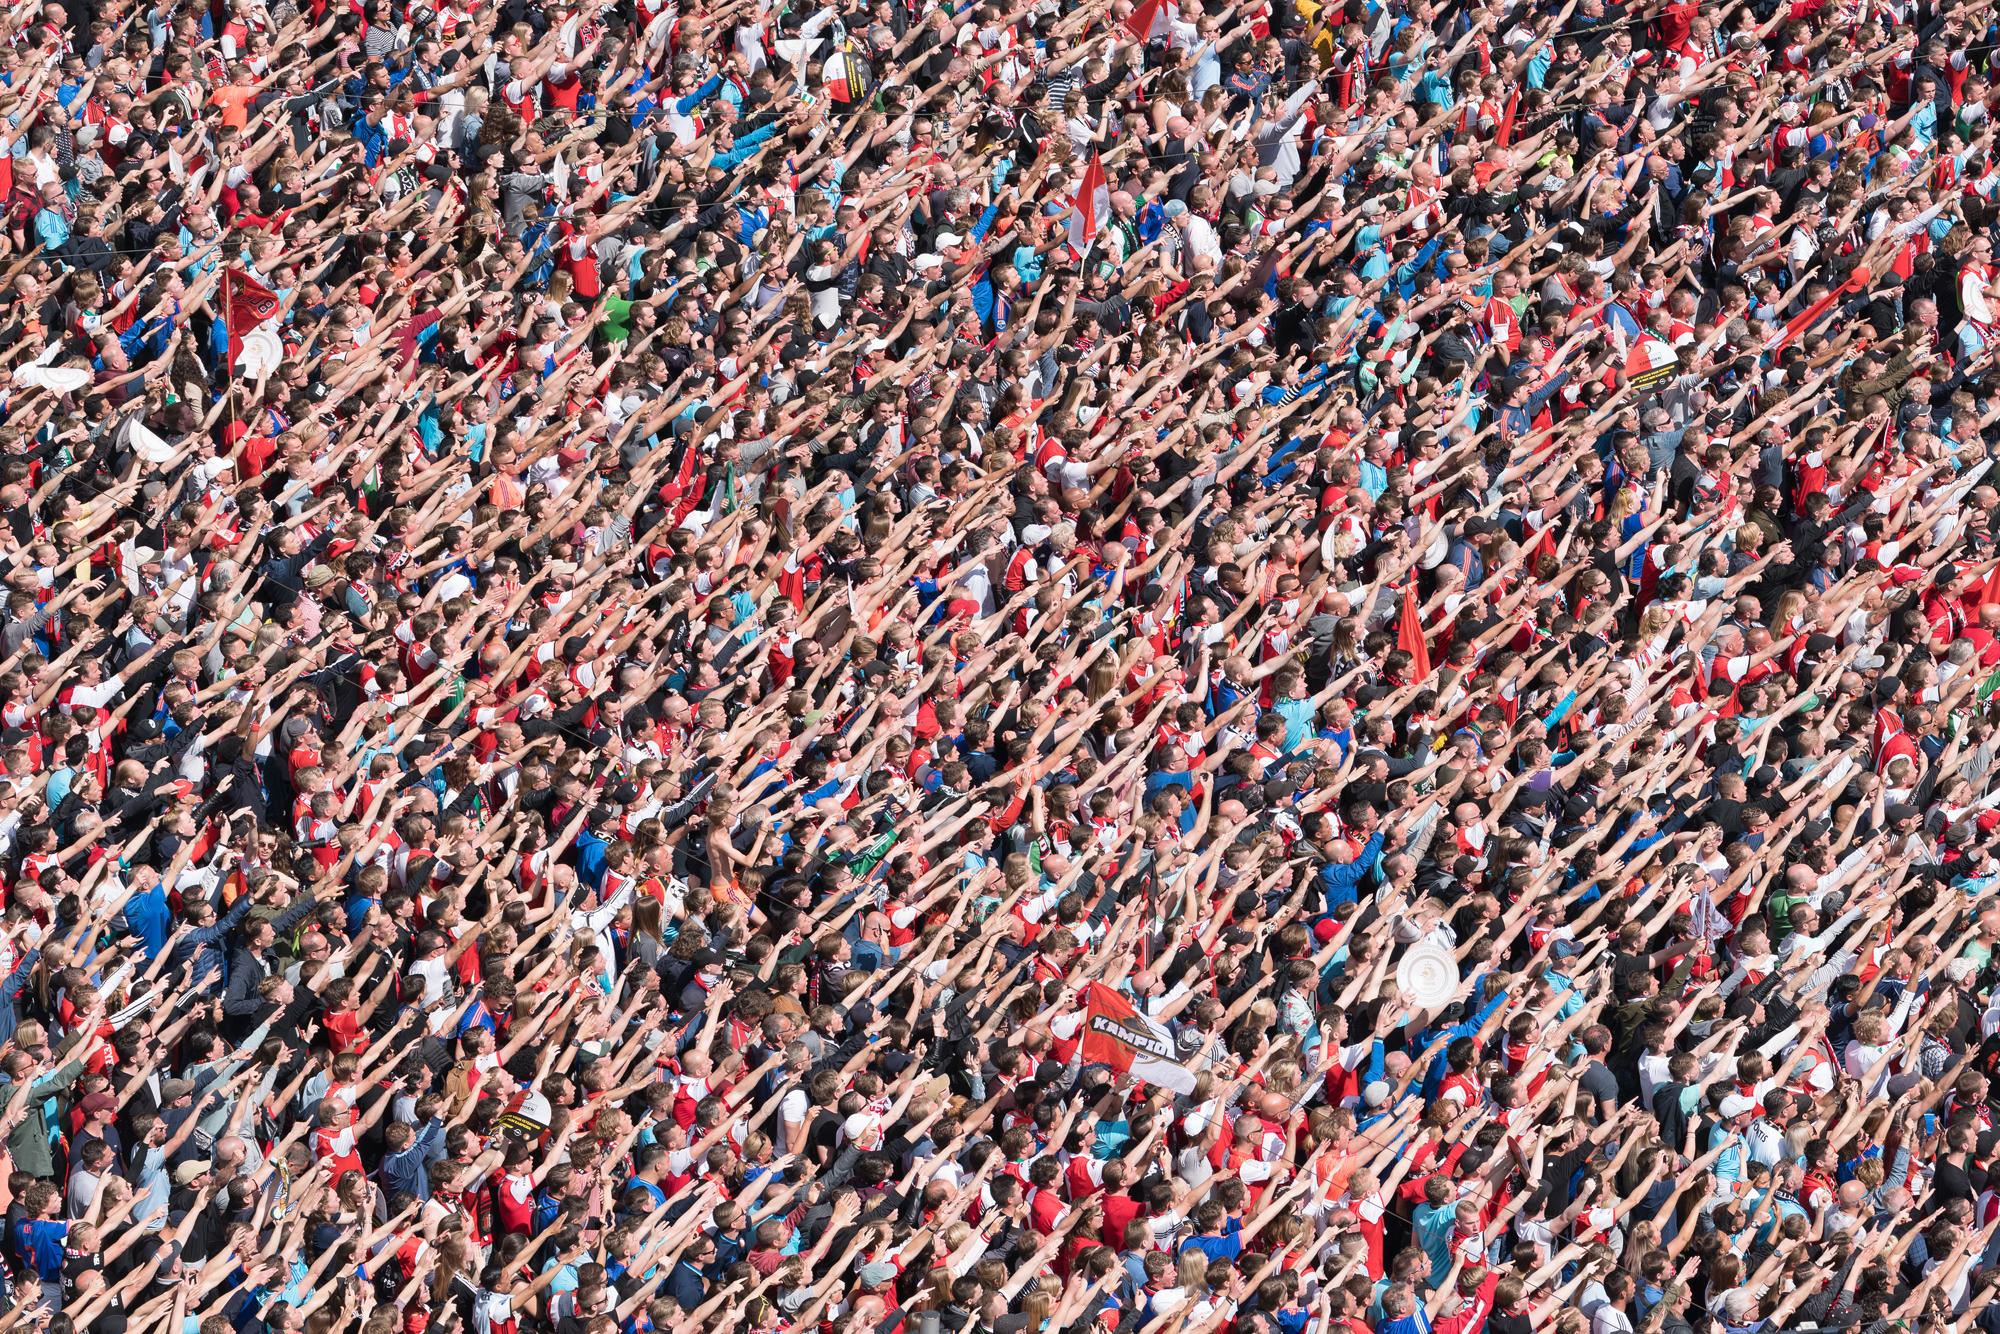 Feyenoord_2017_©Ossip